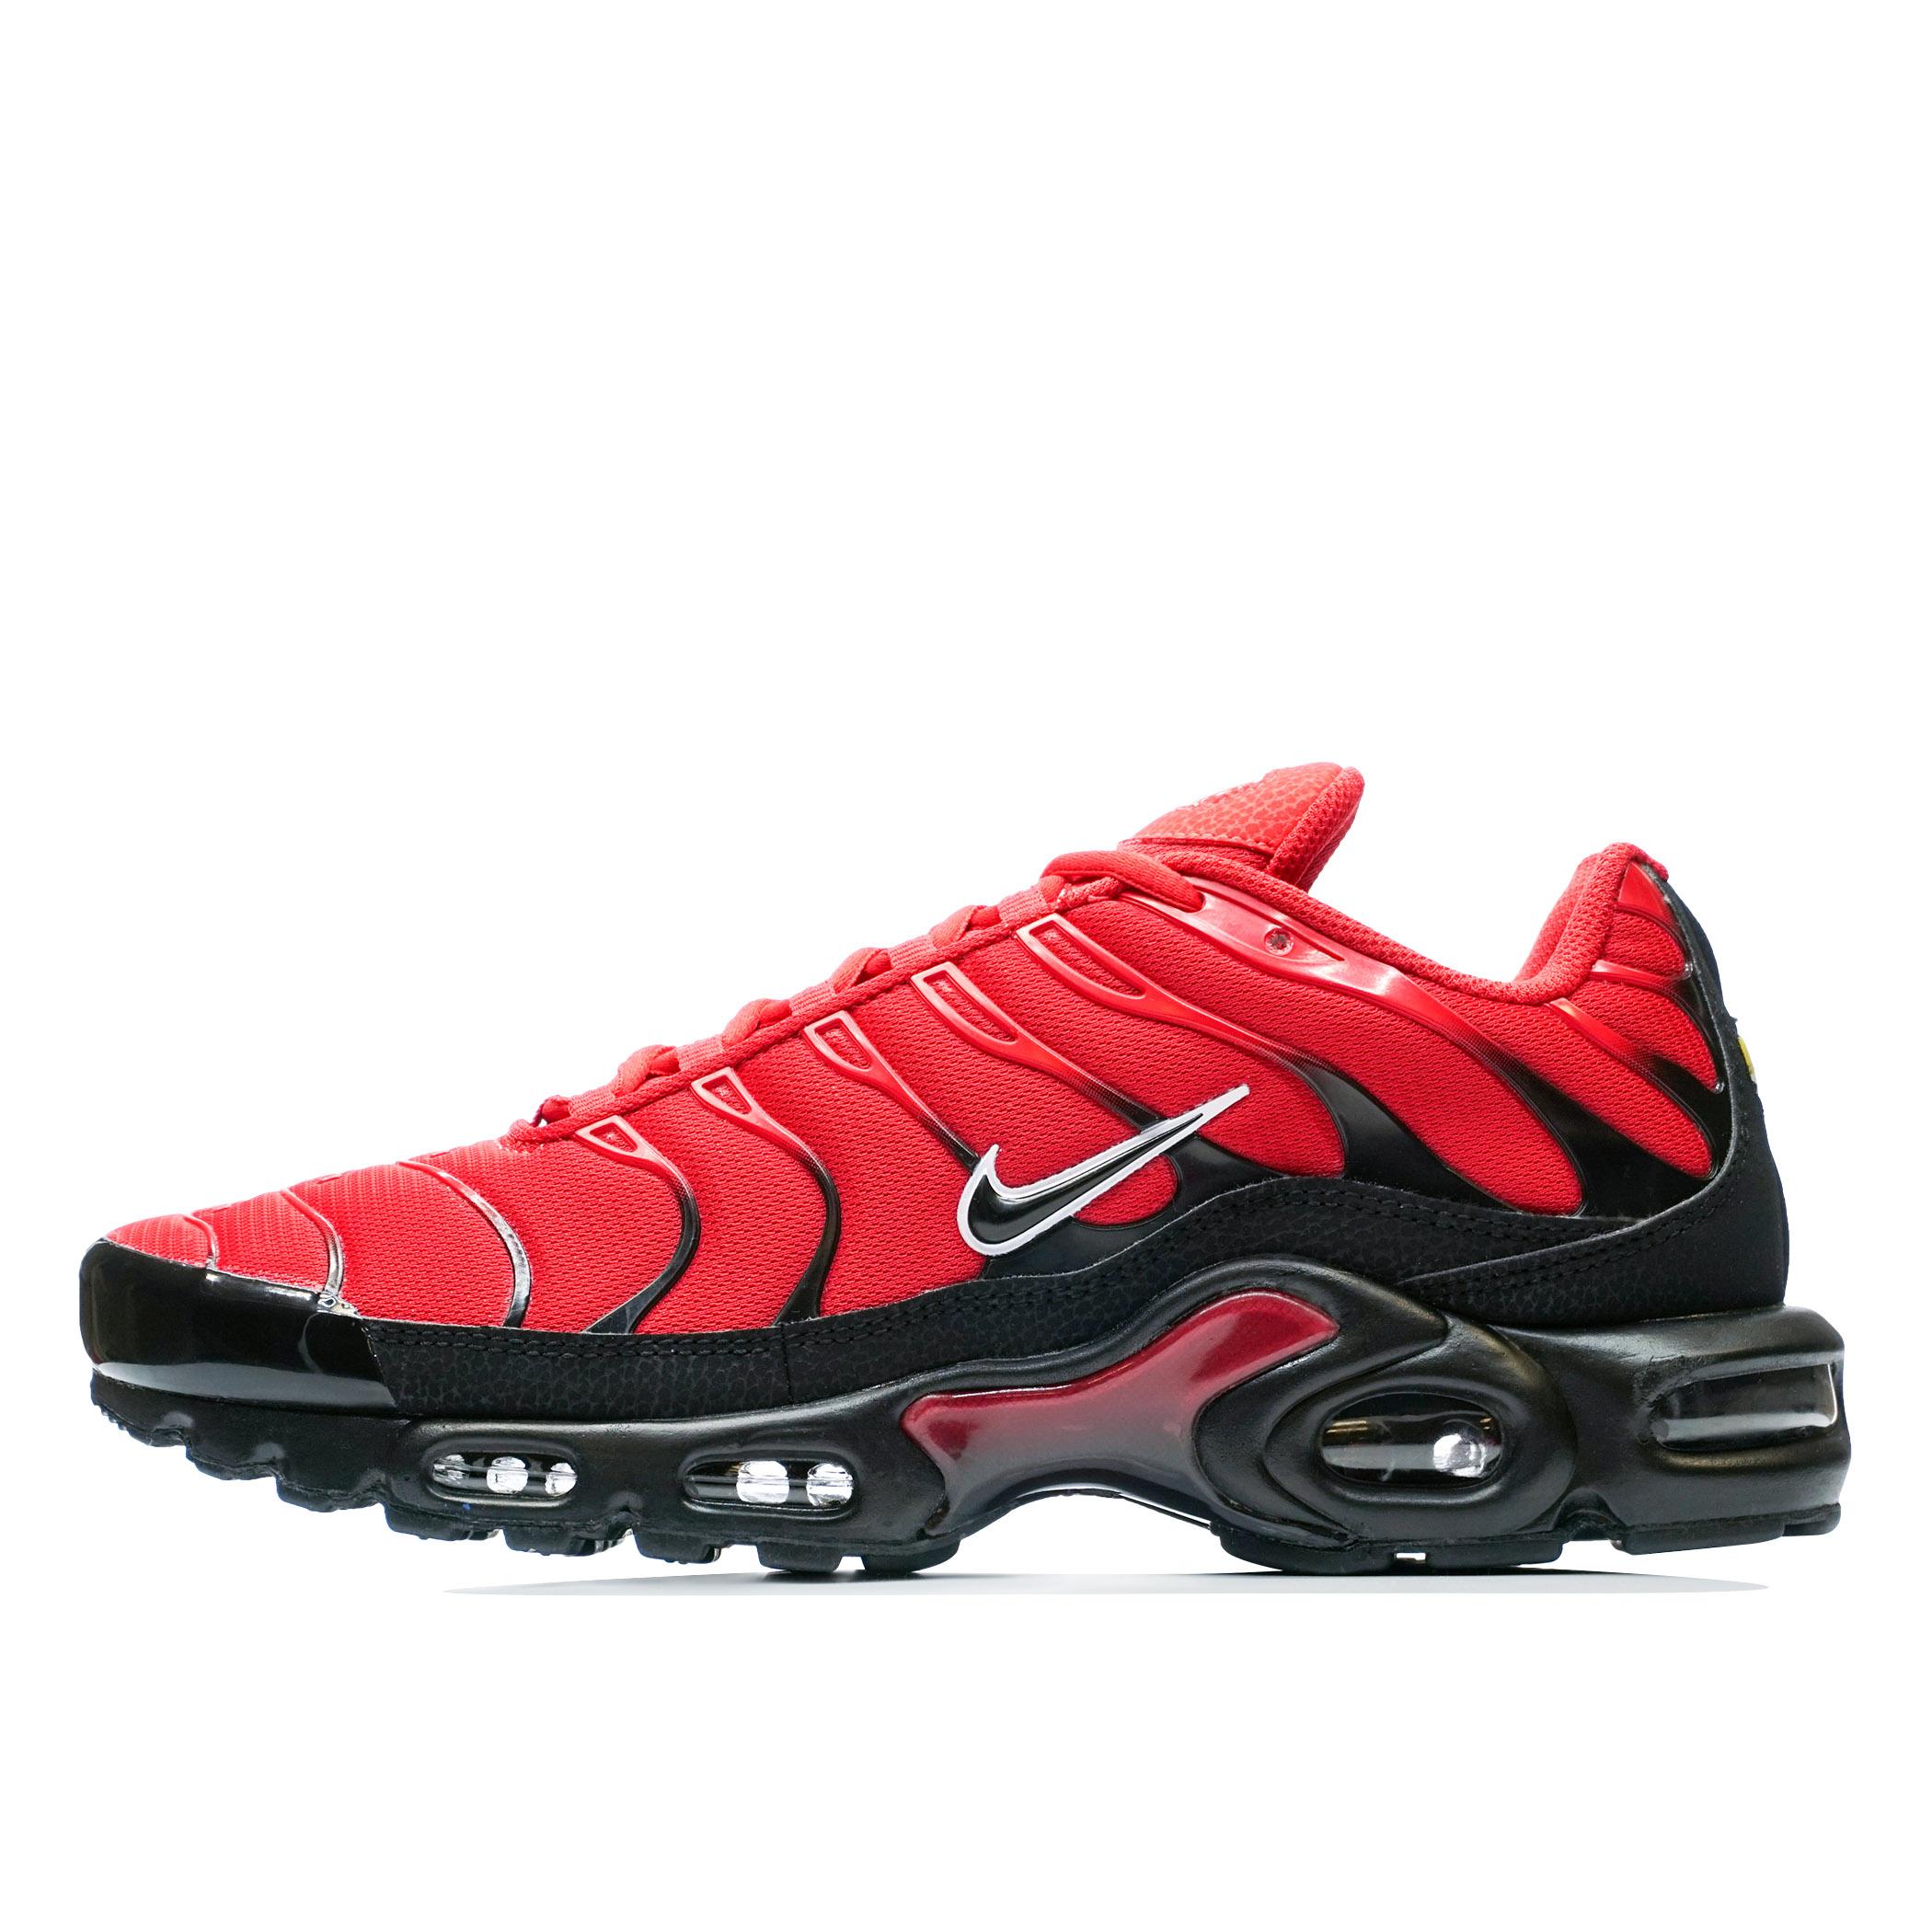 f93230aa Мужские кроссовки Nike Air Max Plus University Red/Black-White - фото 1